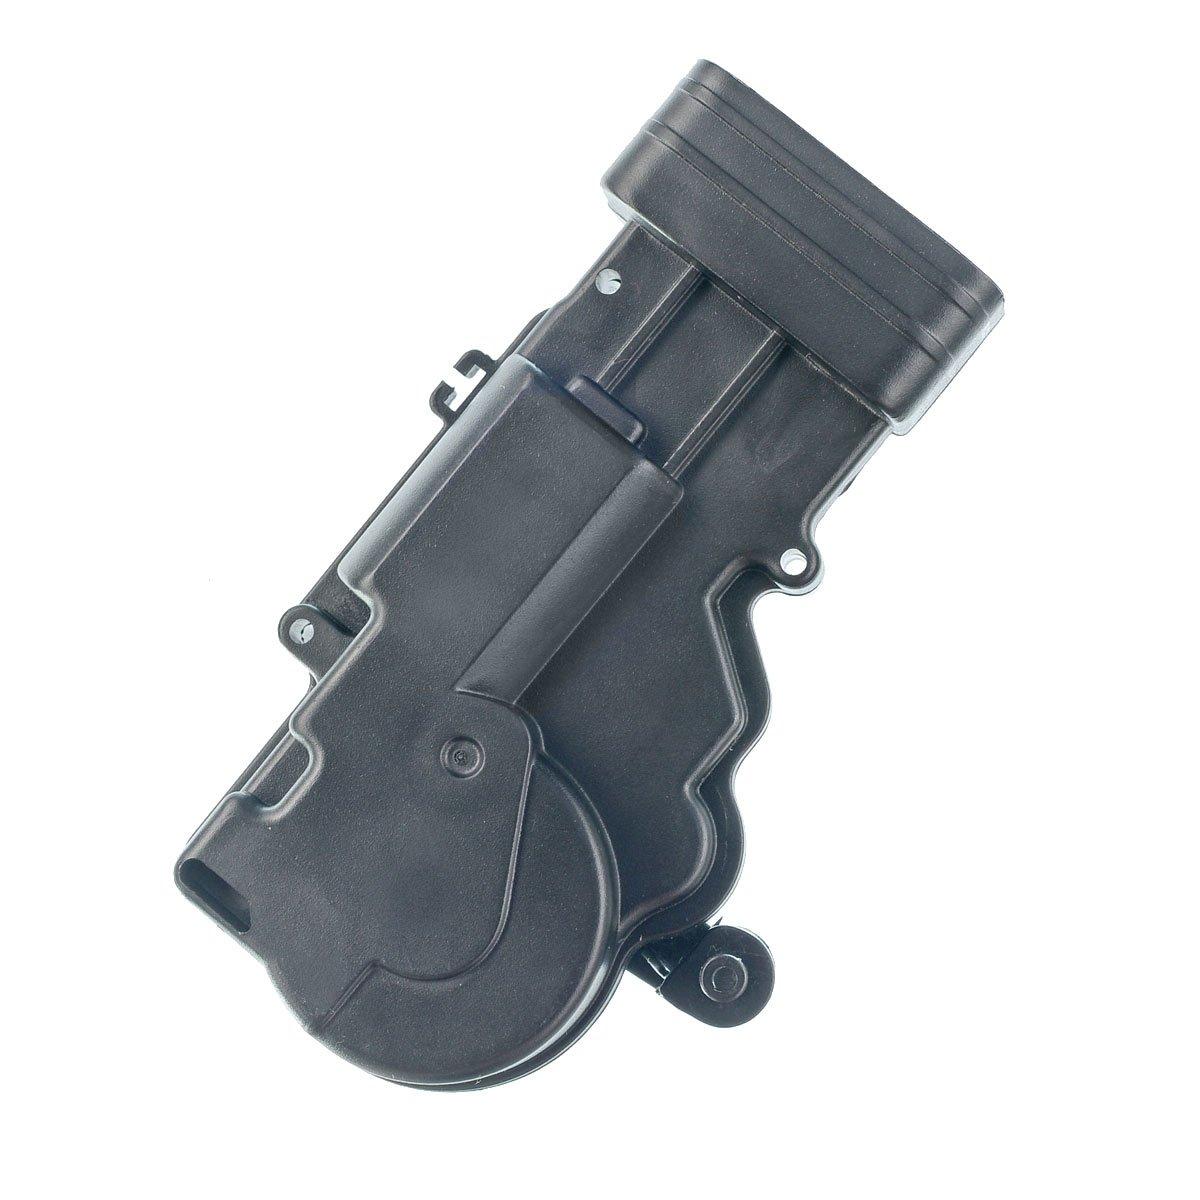 A-Premium Rear Tailgate Liftgate Lock Actuator Motor for Toyota Sequoia 2001-2007 PremiumpartsWhosale